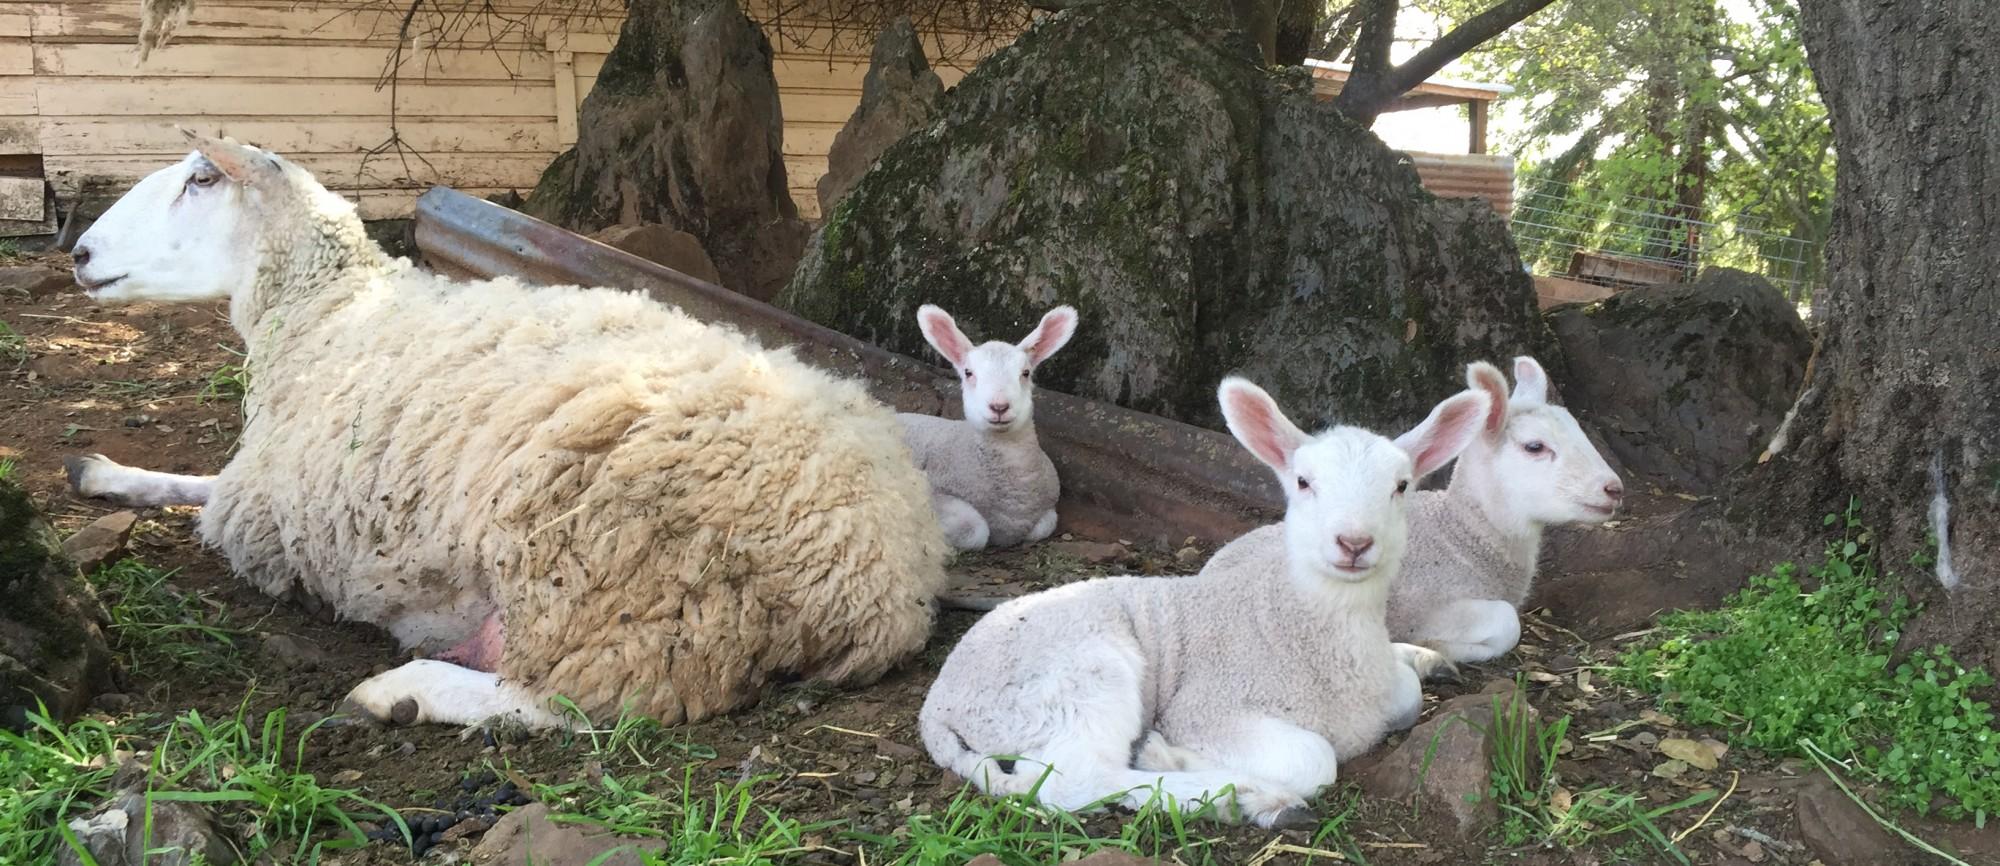 Four Tines Farm & Farm Stand